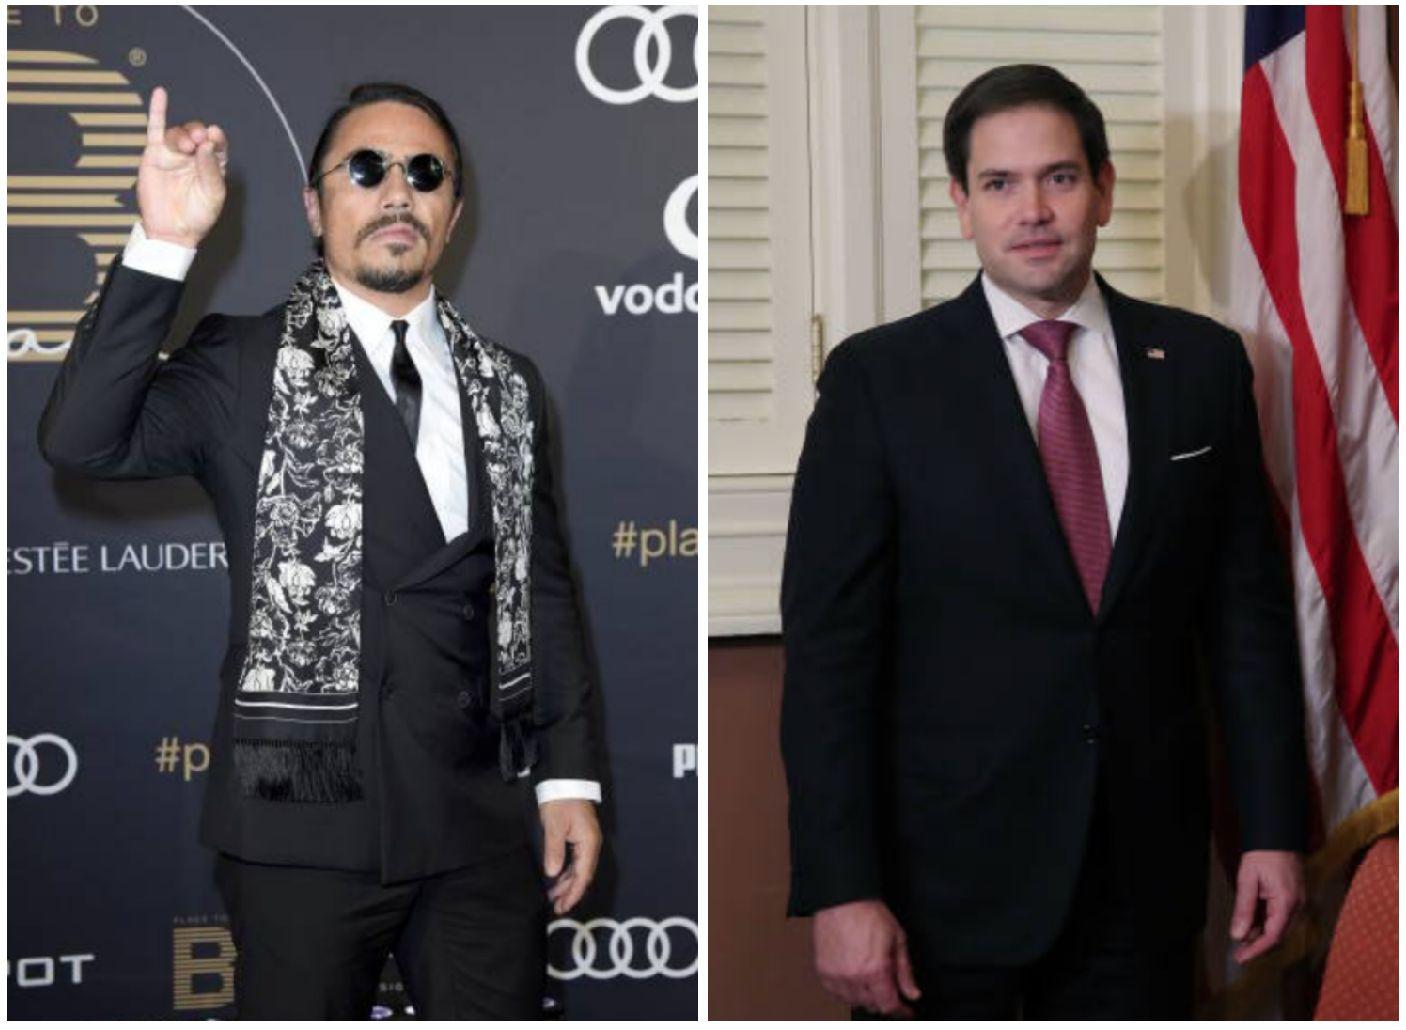 Marco Rubio Goes Off On Salt Bae For Serving Venezuela's Maduro